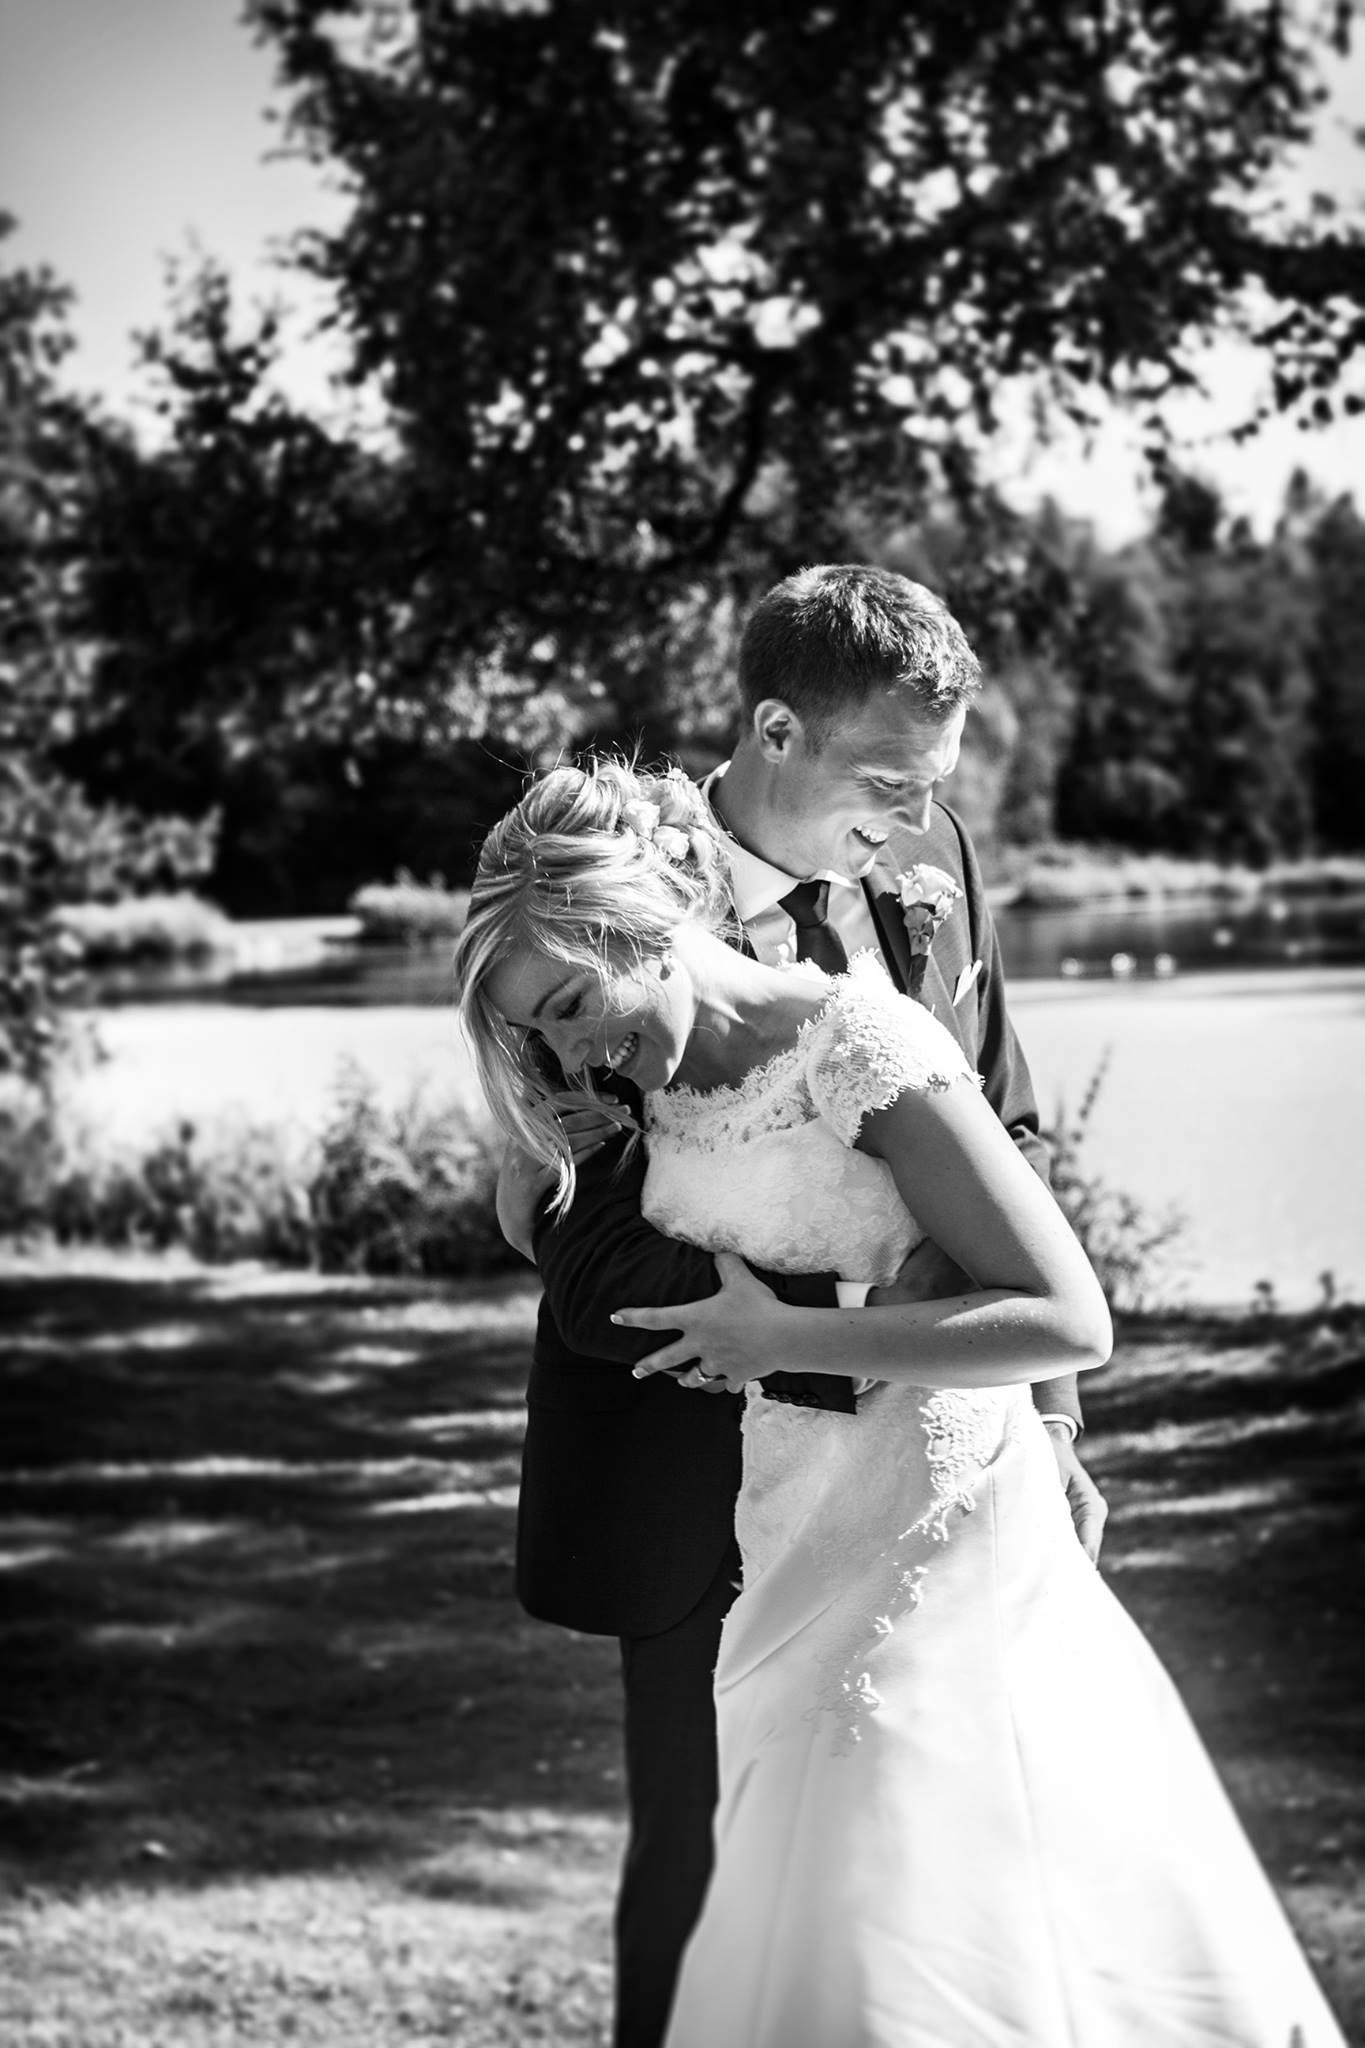 Bryllup-dans-sjov-park